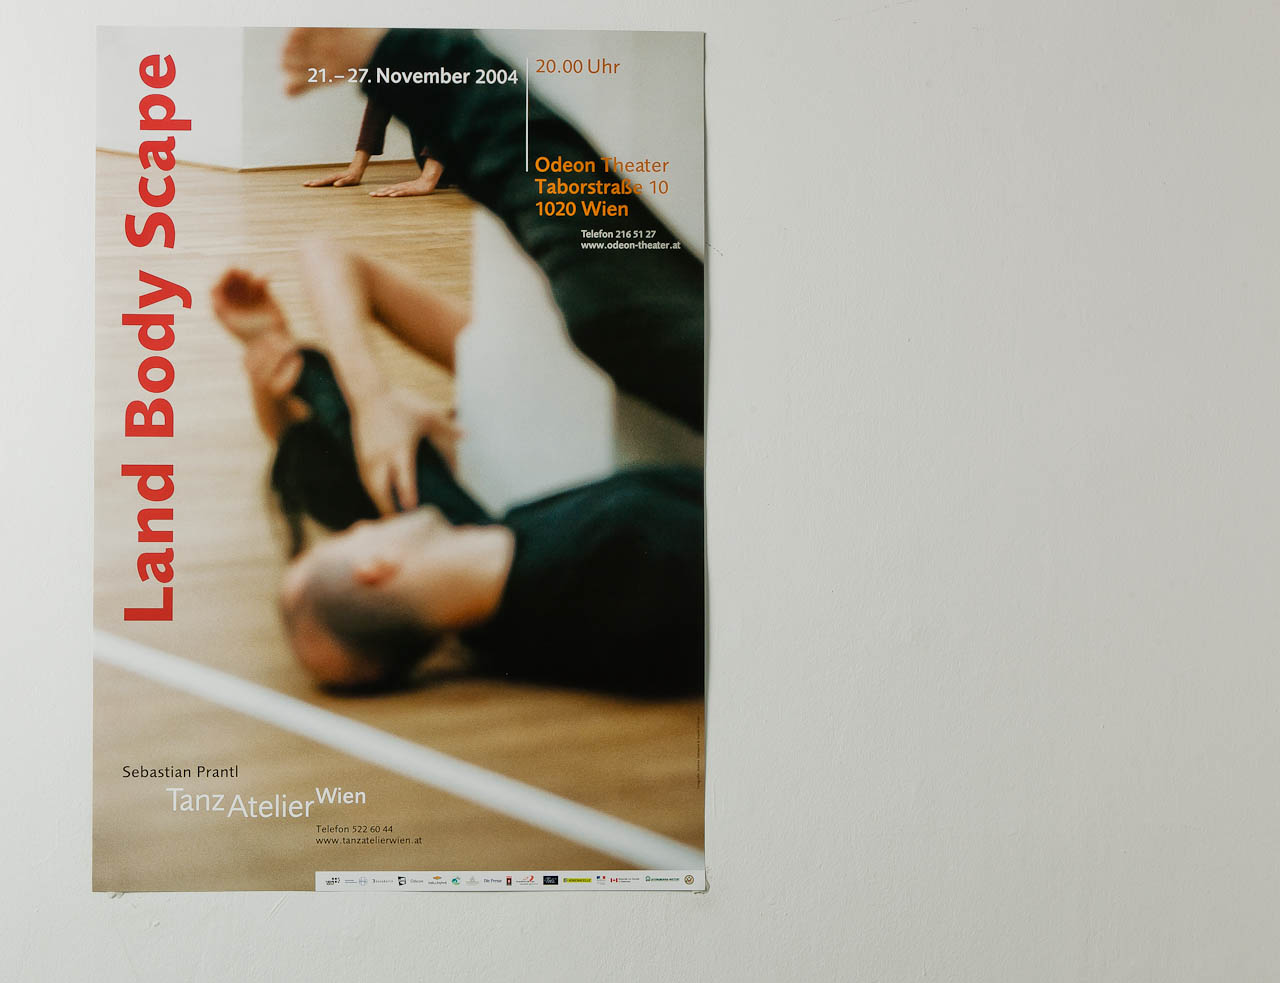 TanzAtelier - Land Body Scape (Plakat)